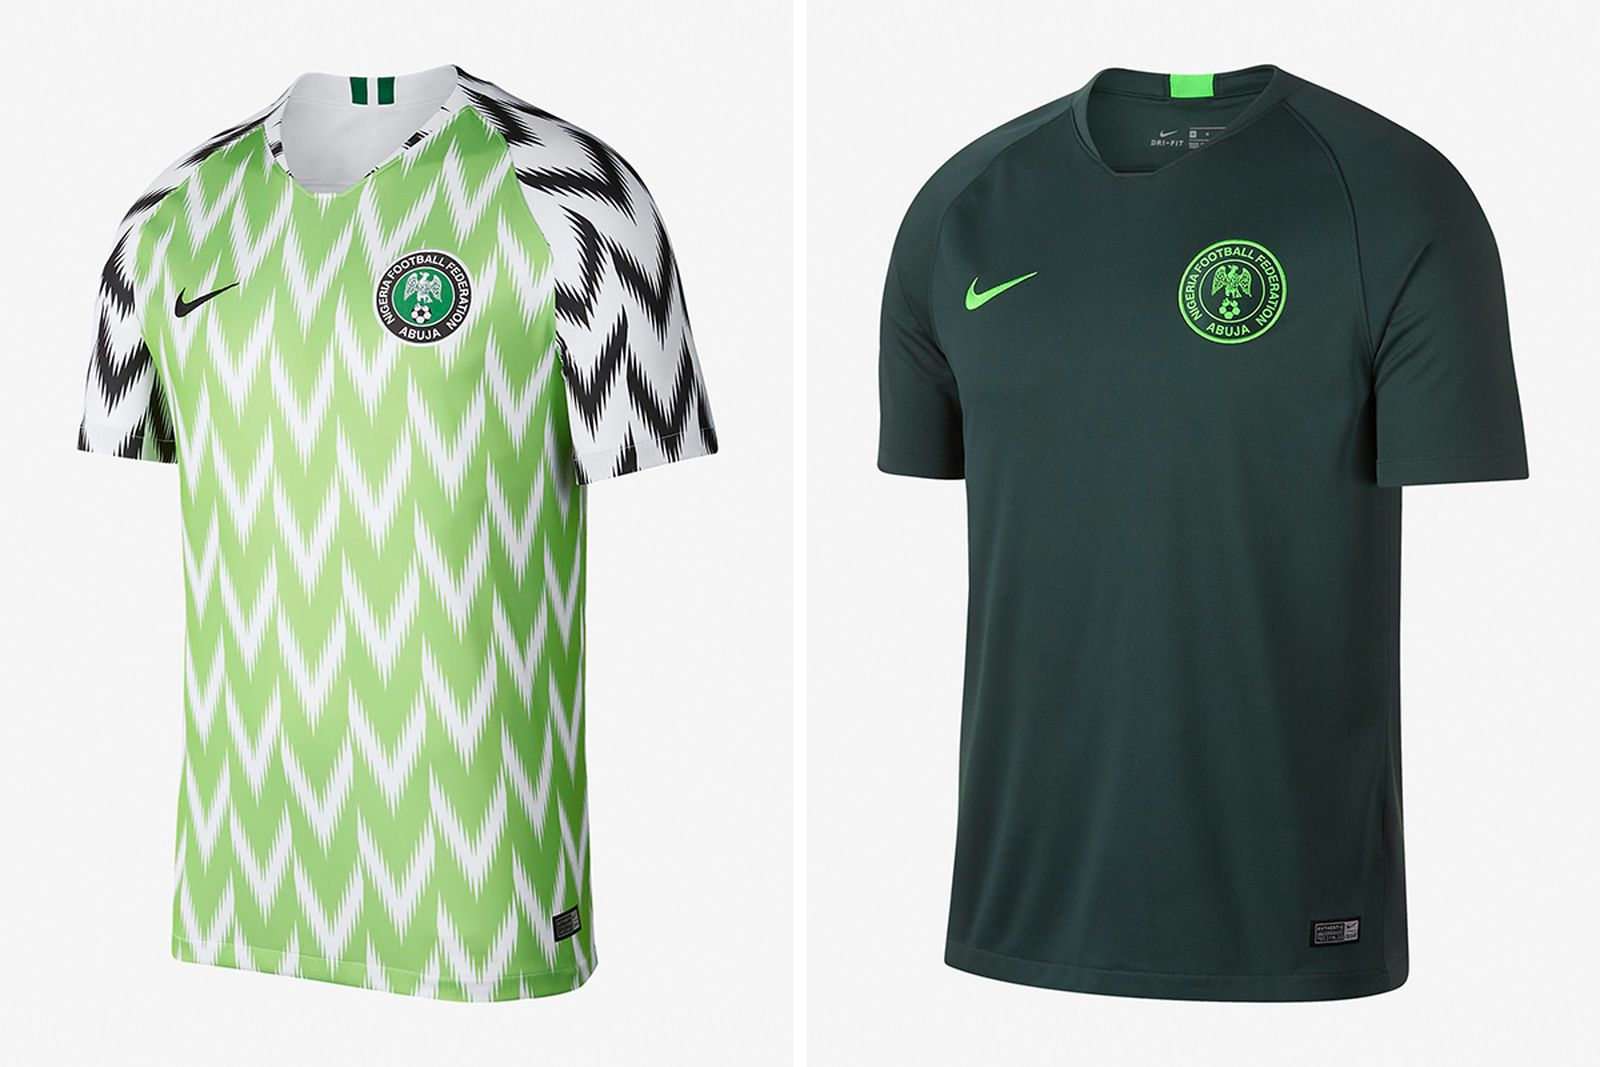 nigeria jersey main 2018 FIFA World Cup nigeria football kit